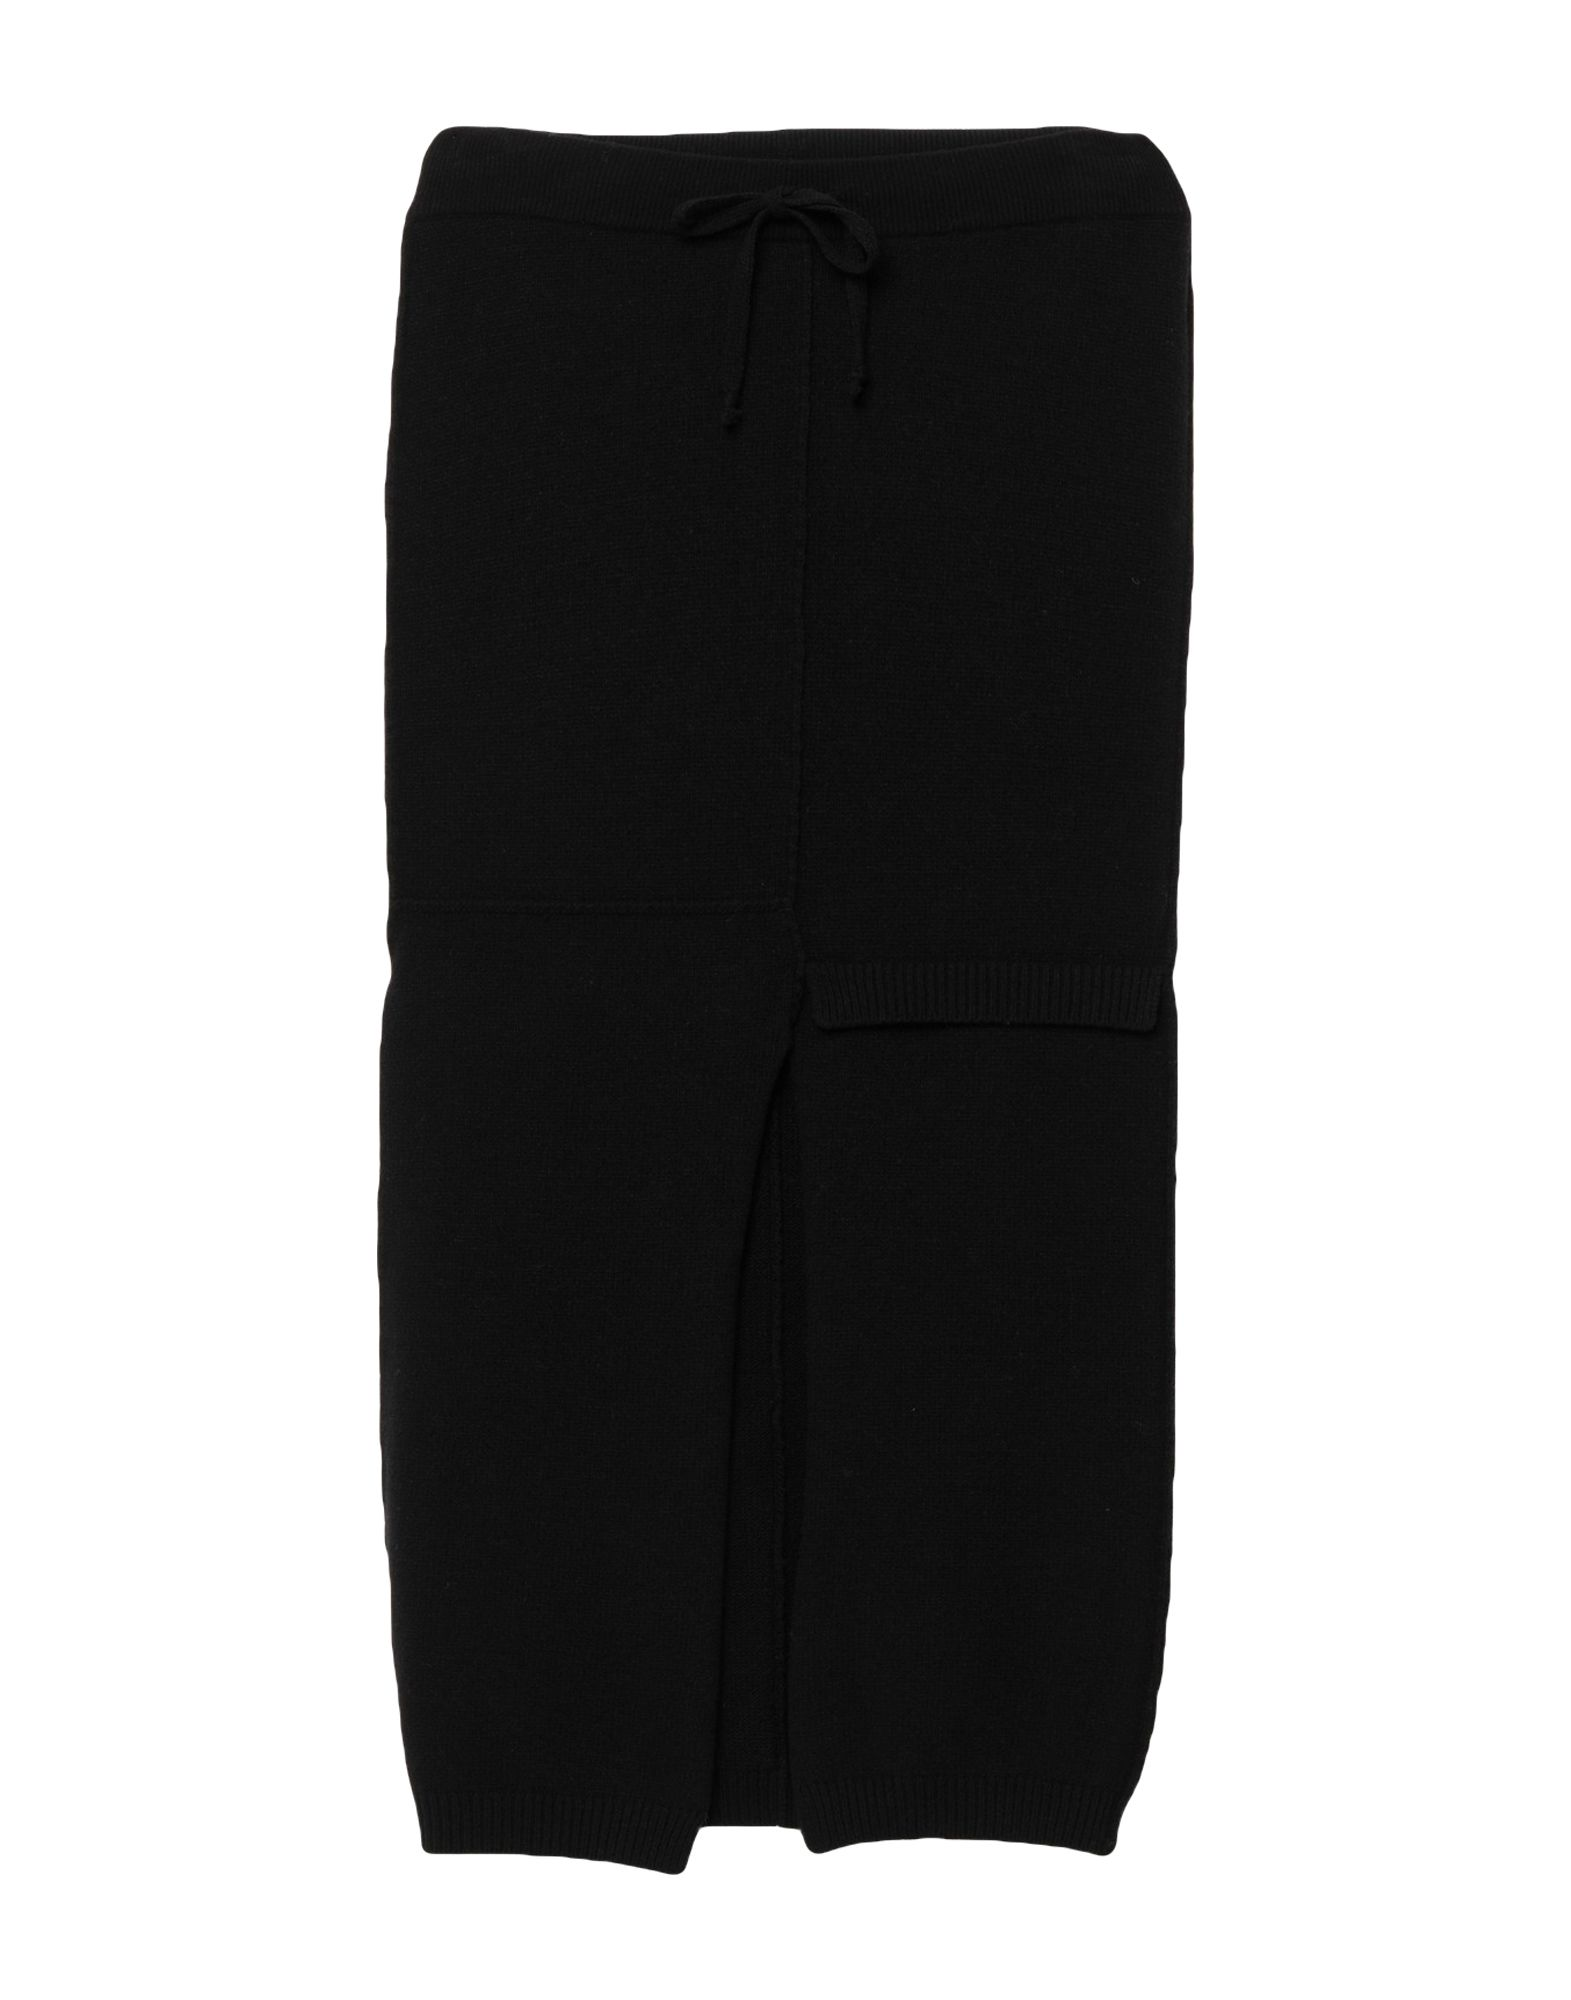 Фото - COLLECTION PRIVĒE? Юбка длиной 3/4 hilfiger collection юбка длиной 3 4